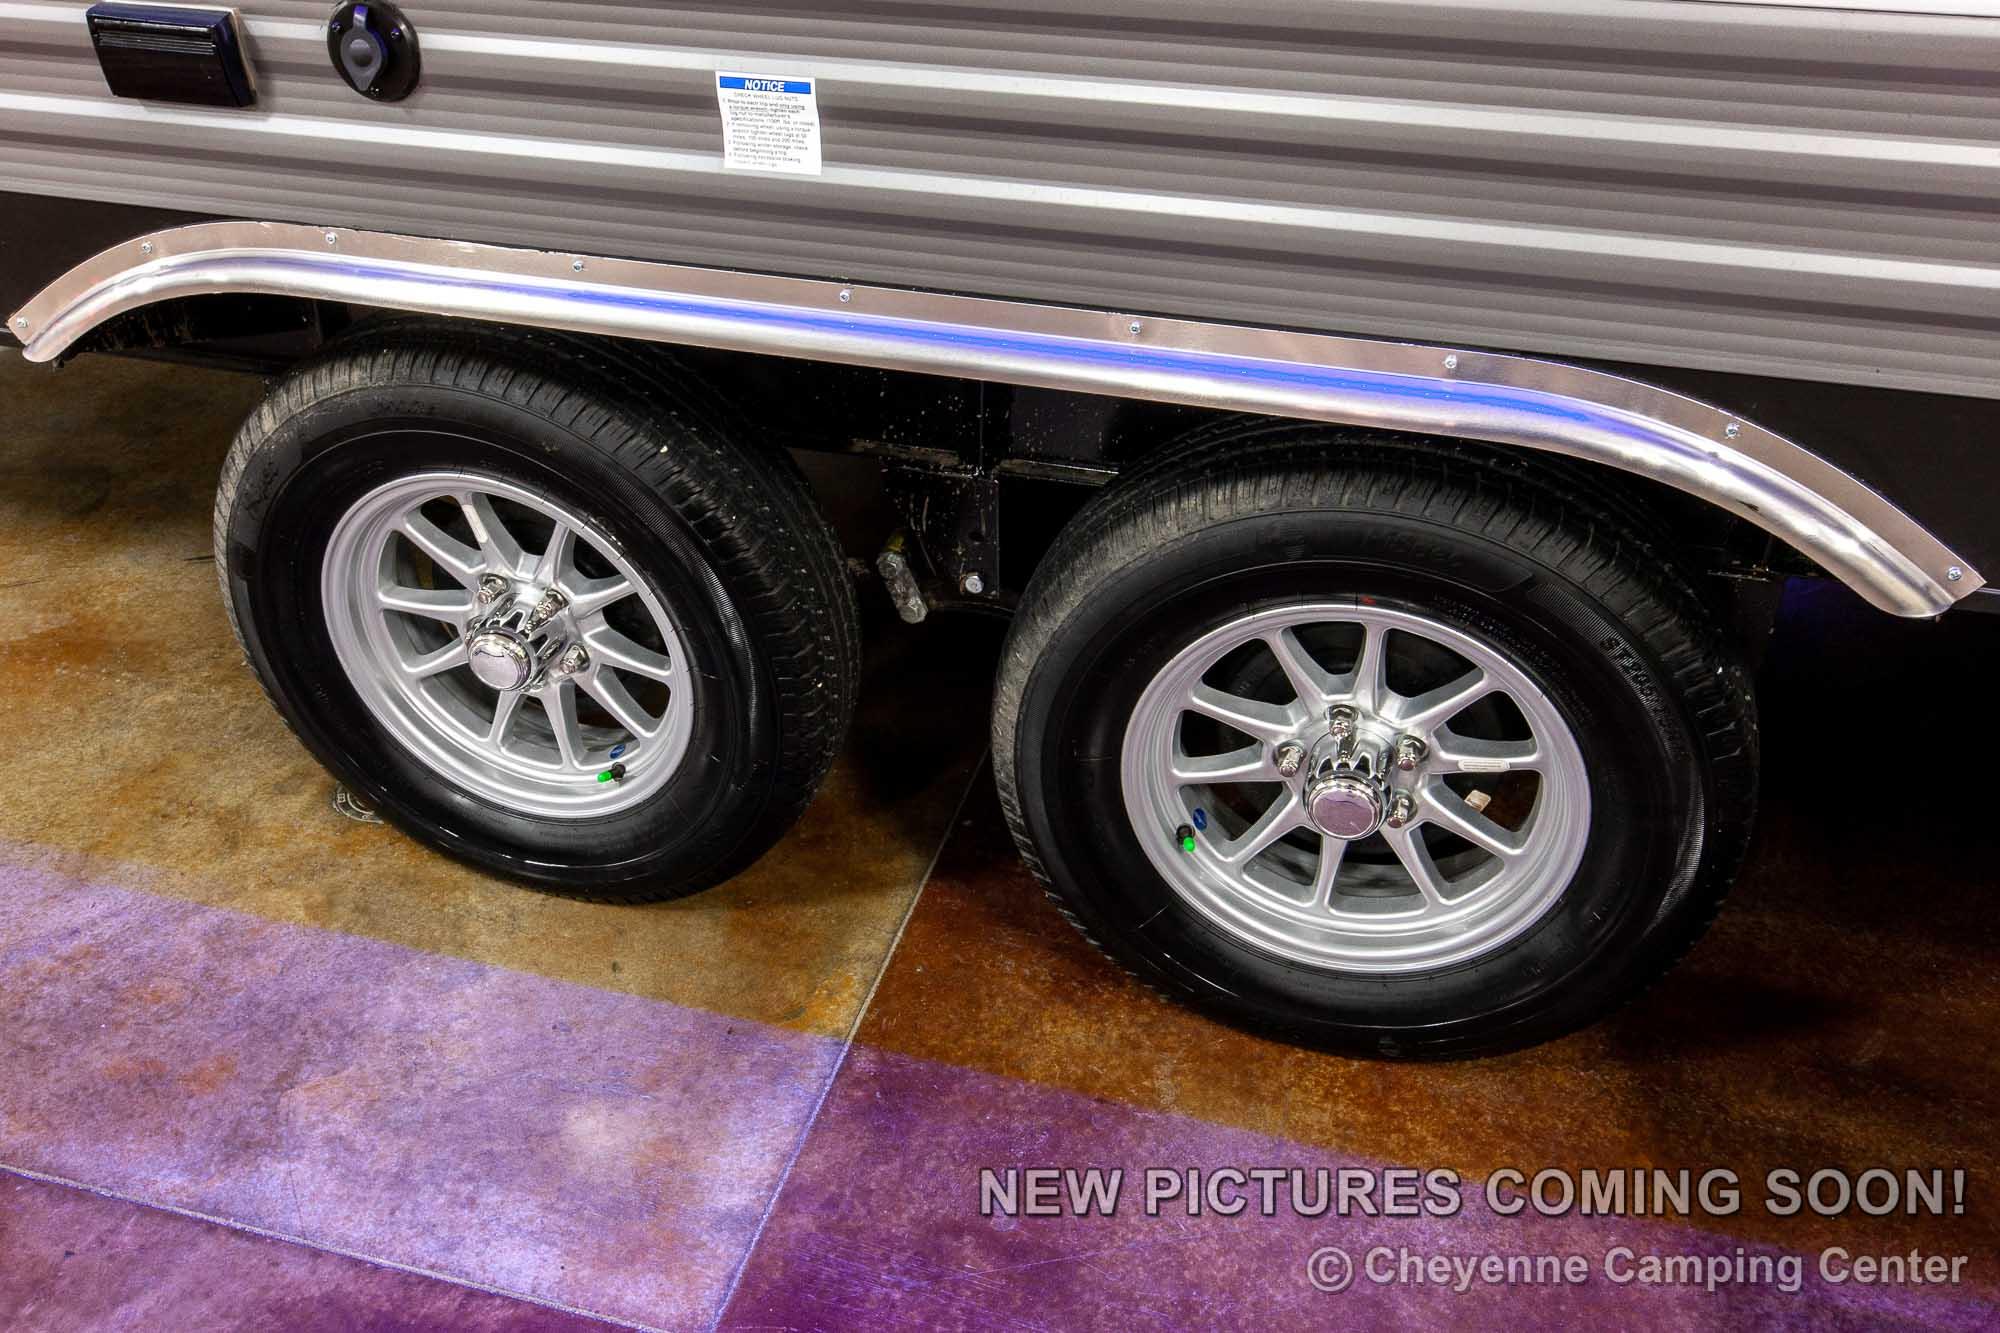 2021 Coachmen Catalina Trail Blazer 26TH Toy Hauler Travel Trailer Exterior Image